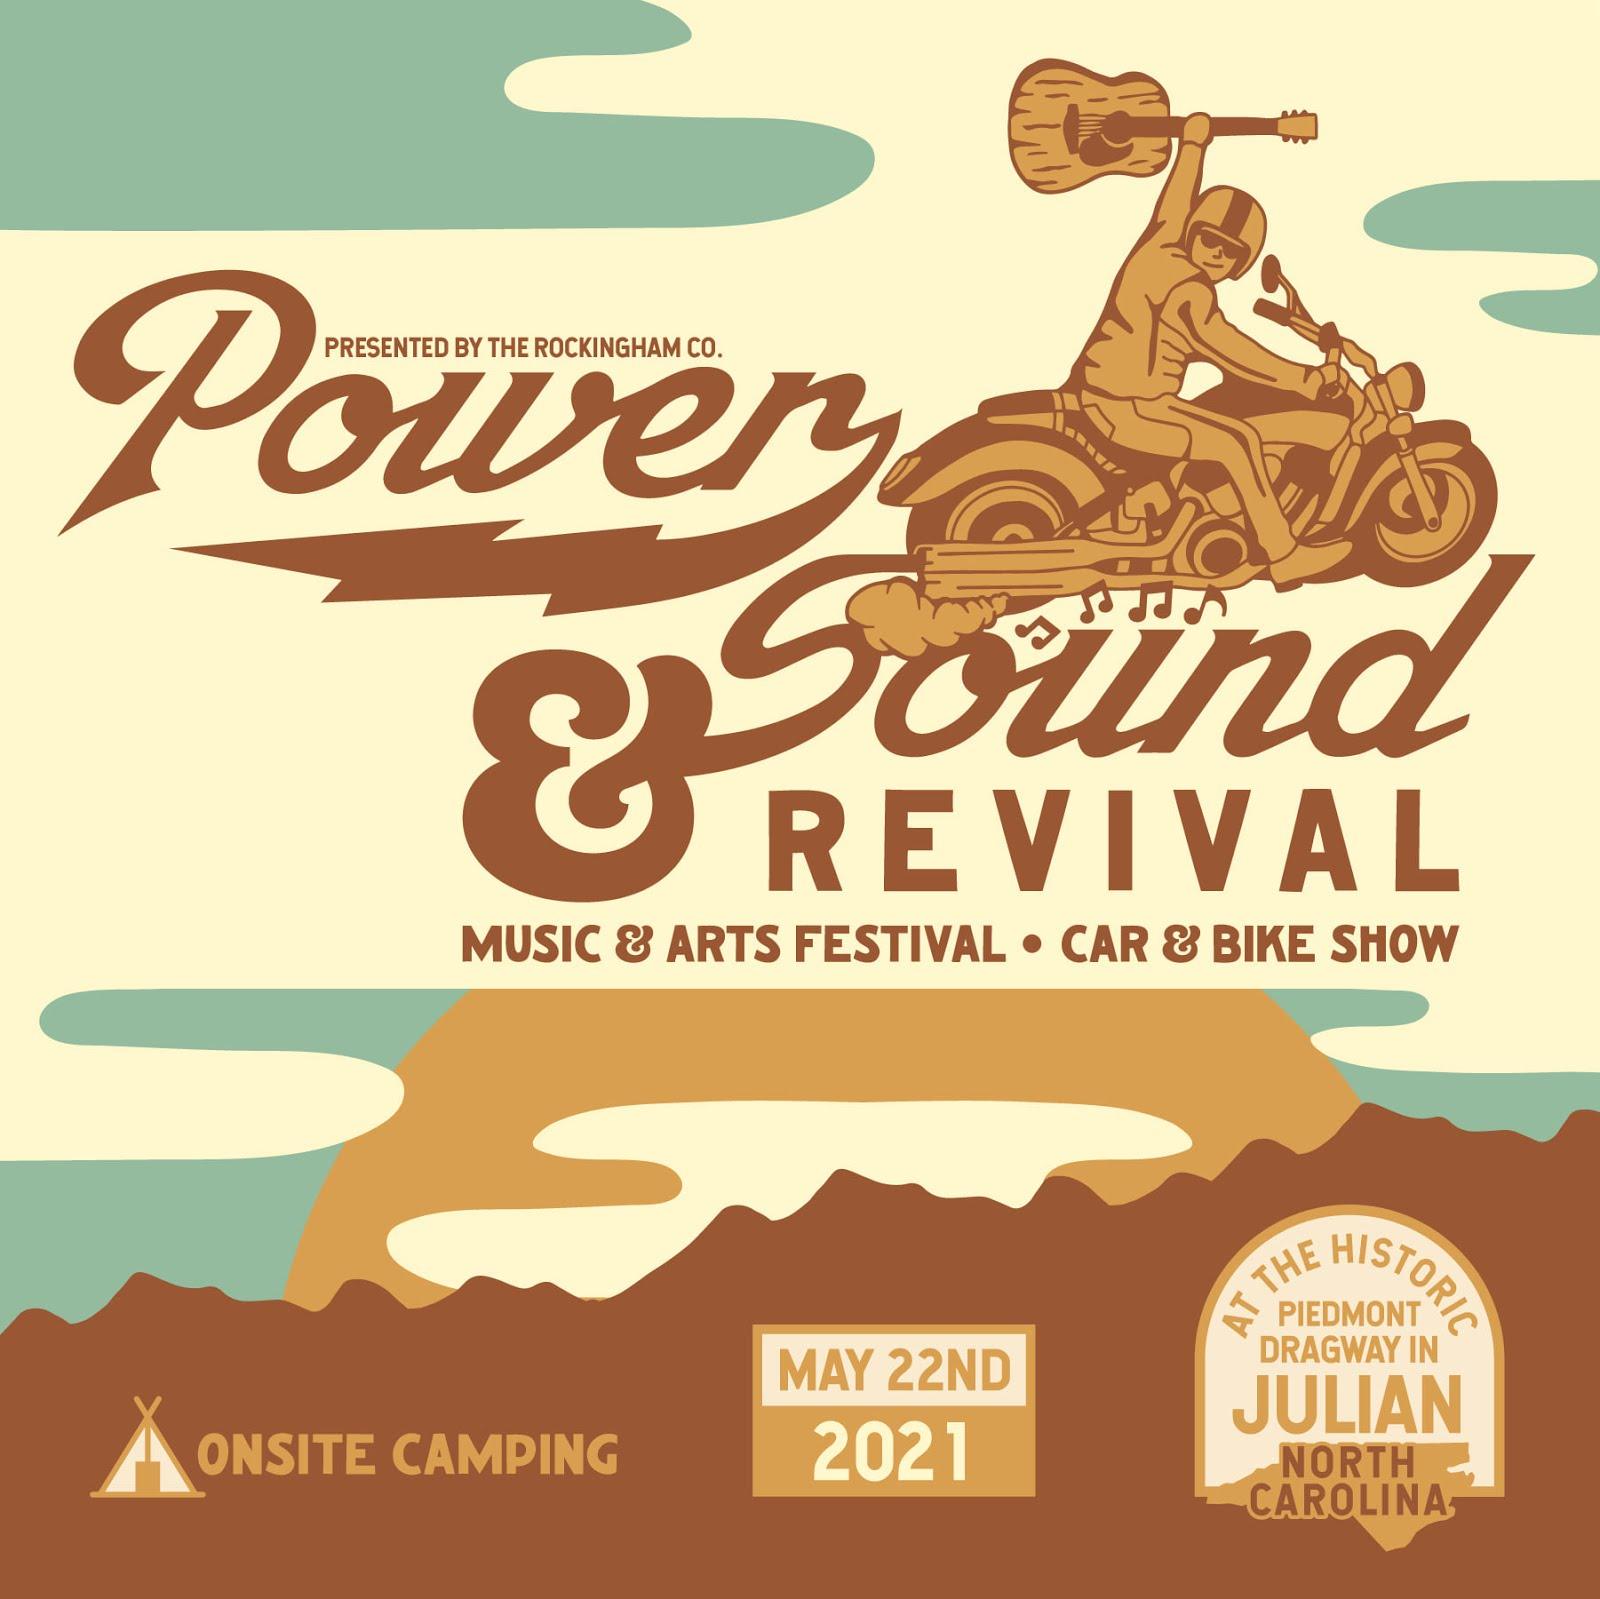 Power & Sound Revival